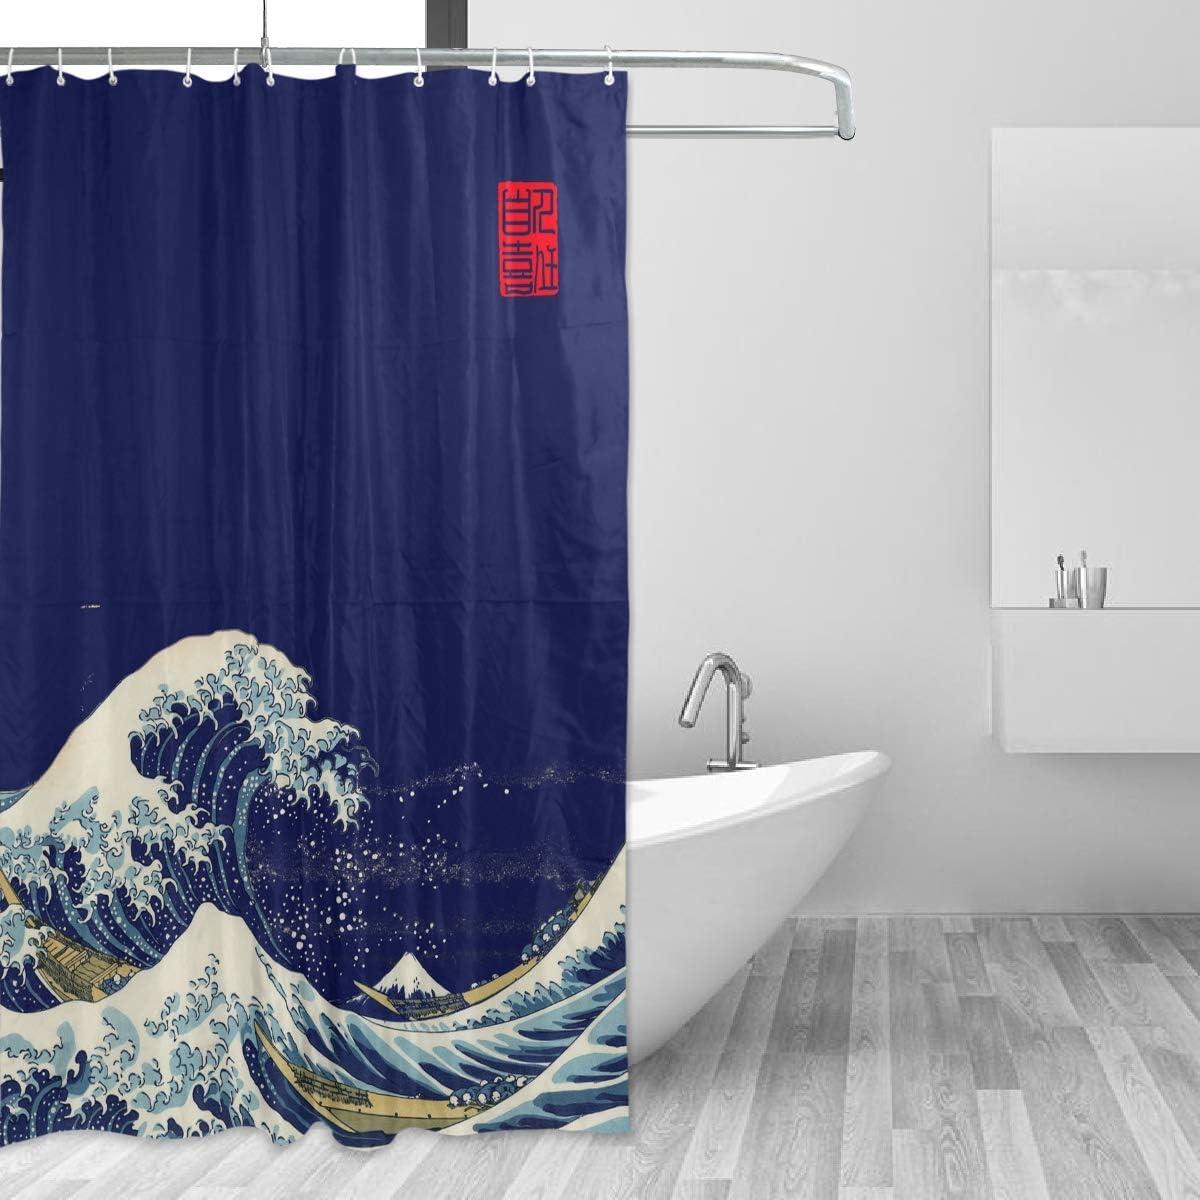 WELLDAY Premium Japanese Wave Shower Curtain, Aquatic Swirls Birds of Ocean Ukiyo-e Style Artwork Greyscale Background, Fabric Bathroom Decor Set with Hooks, Blue - 60x72 inch